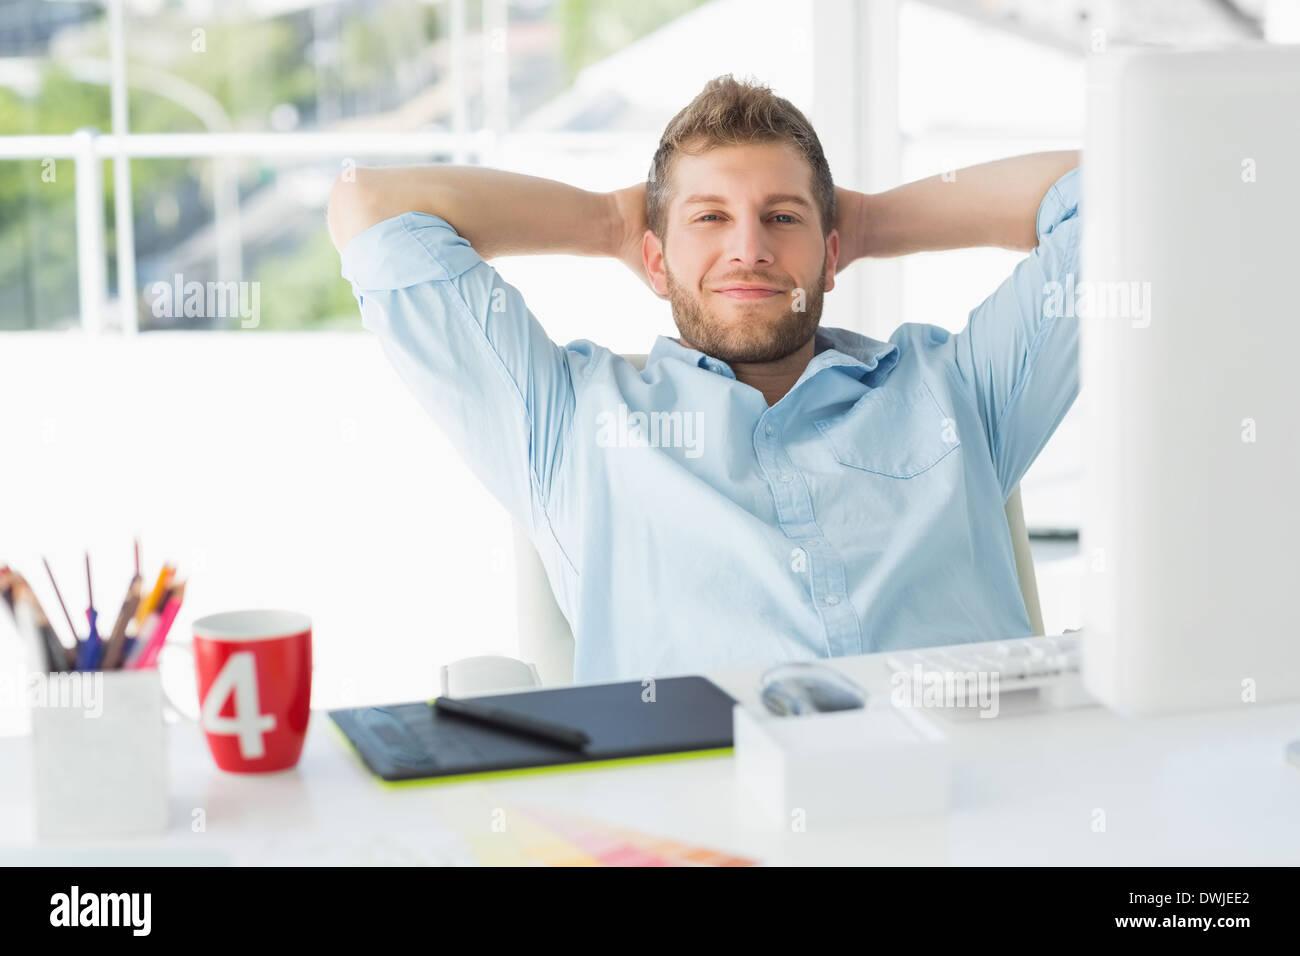 Designer relaxing at his desk smiling at camera - Stock Image